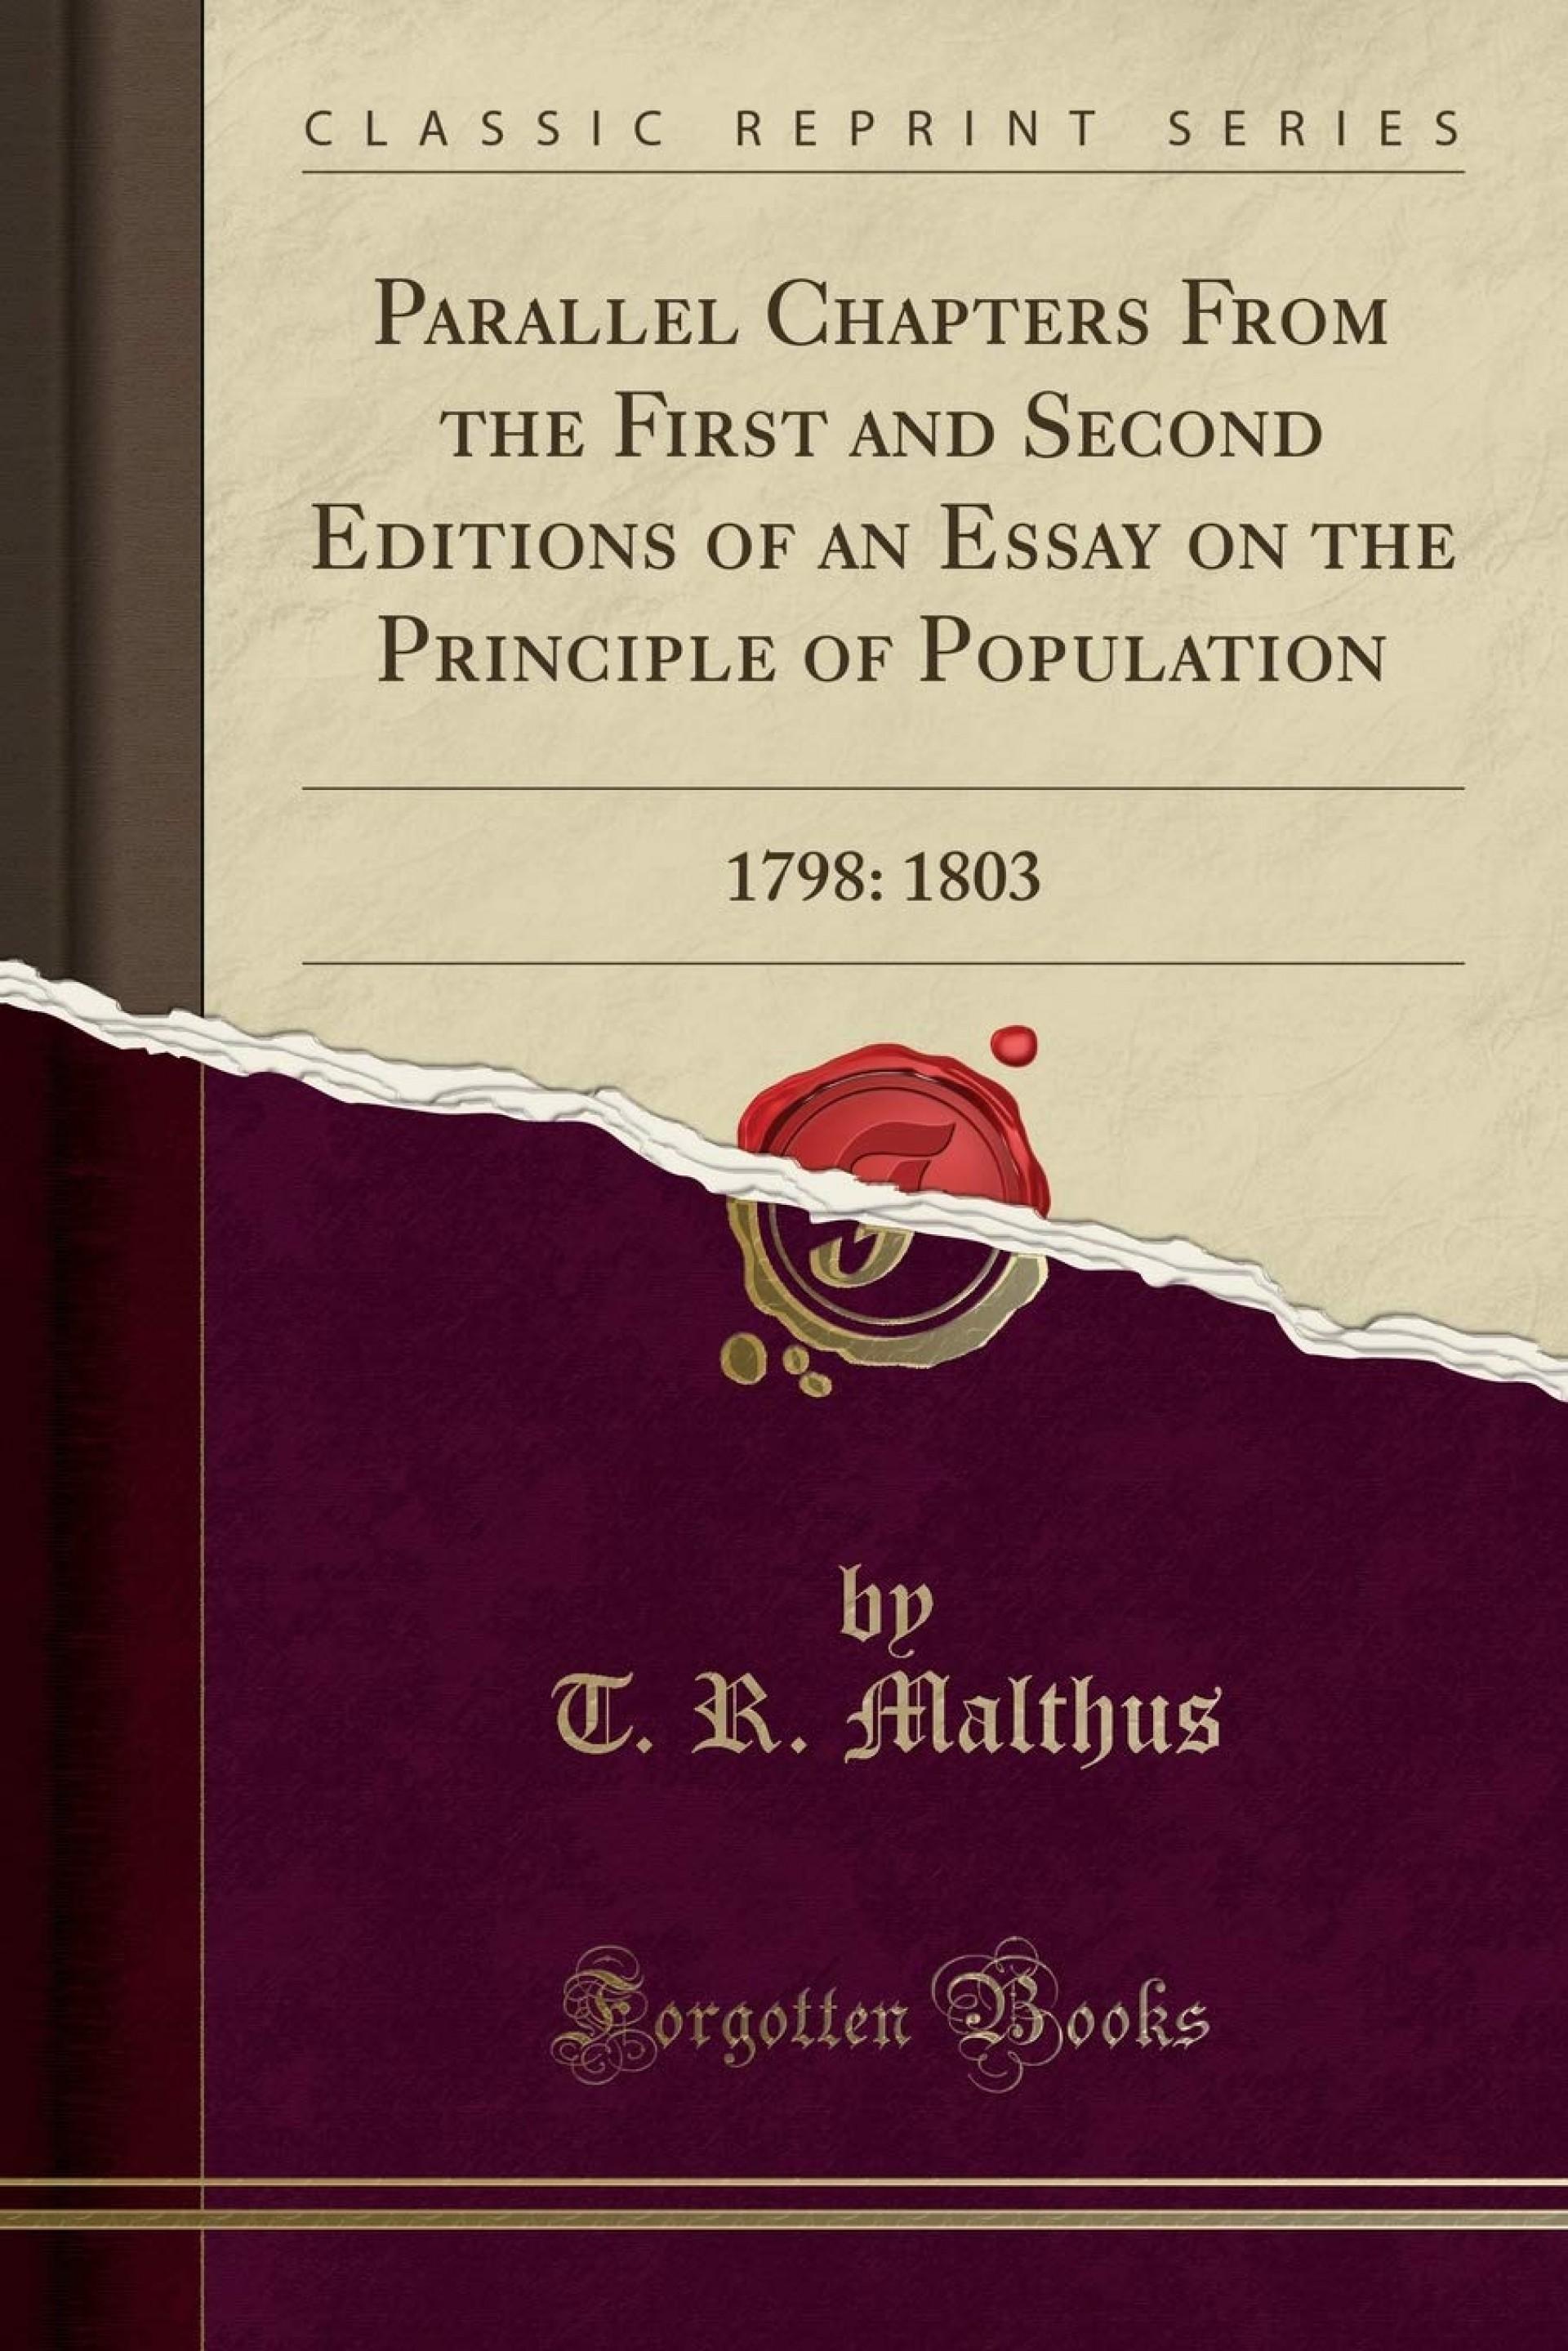 017 61xy24cllwl Essay On The Principle Of Population Singular Pdf By Thomas Malthus Main Idea 1920